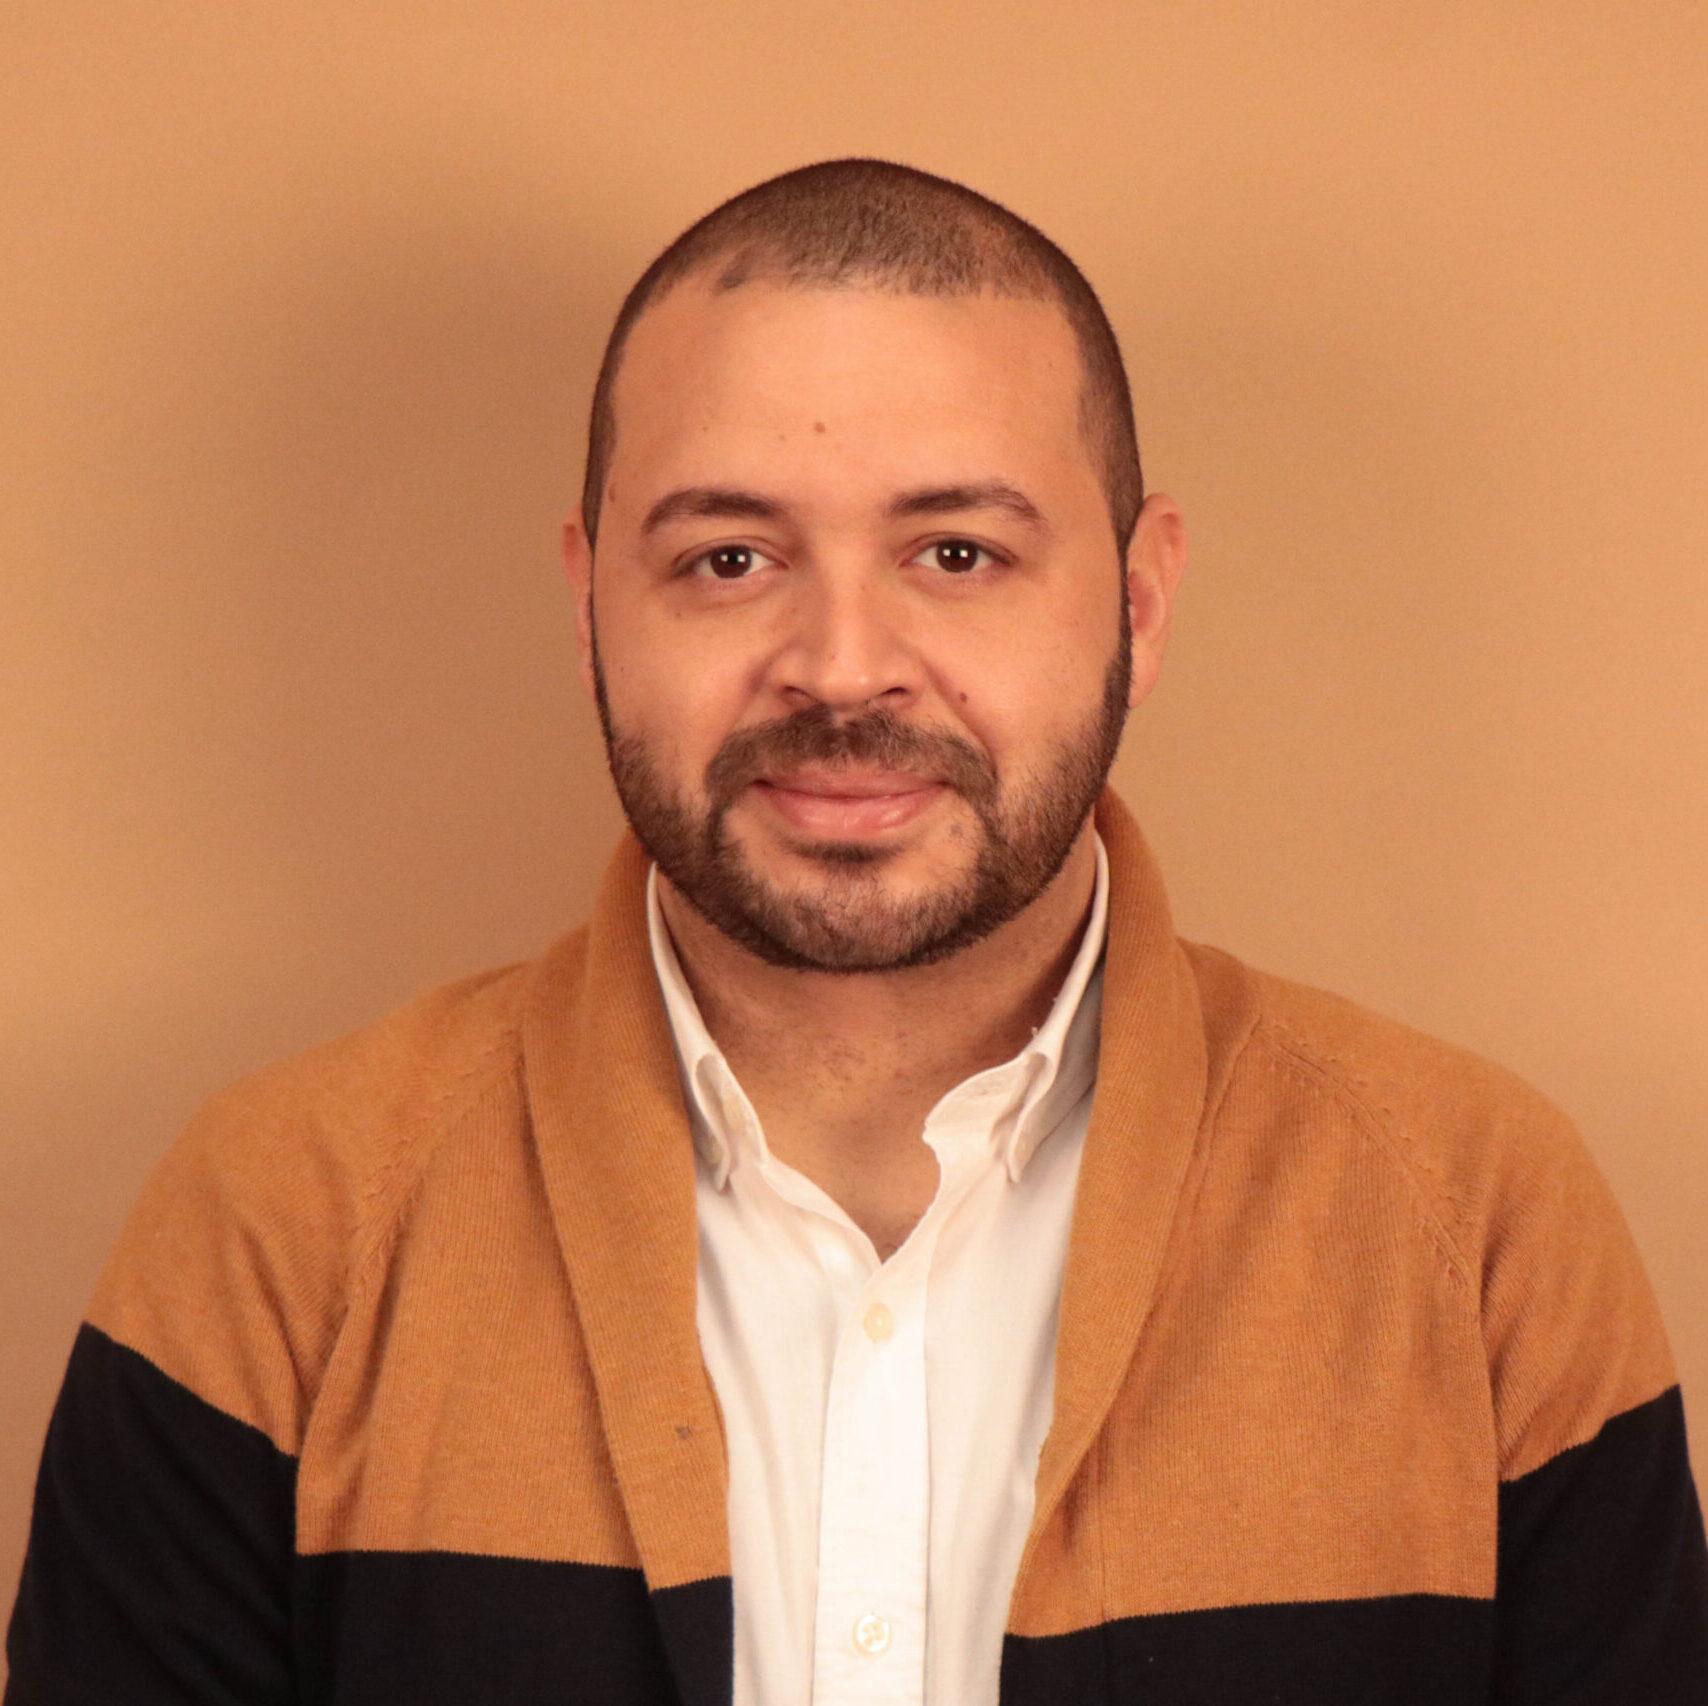 Ricardo Ramirez